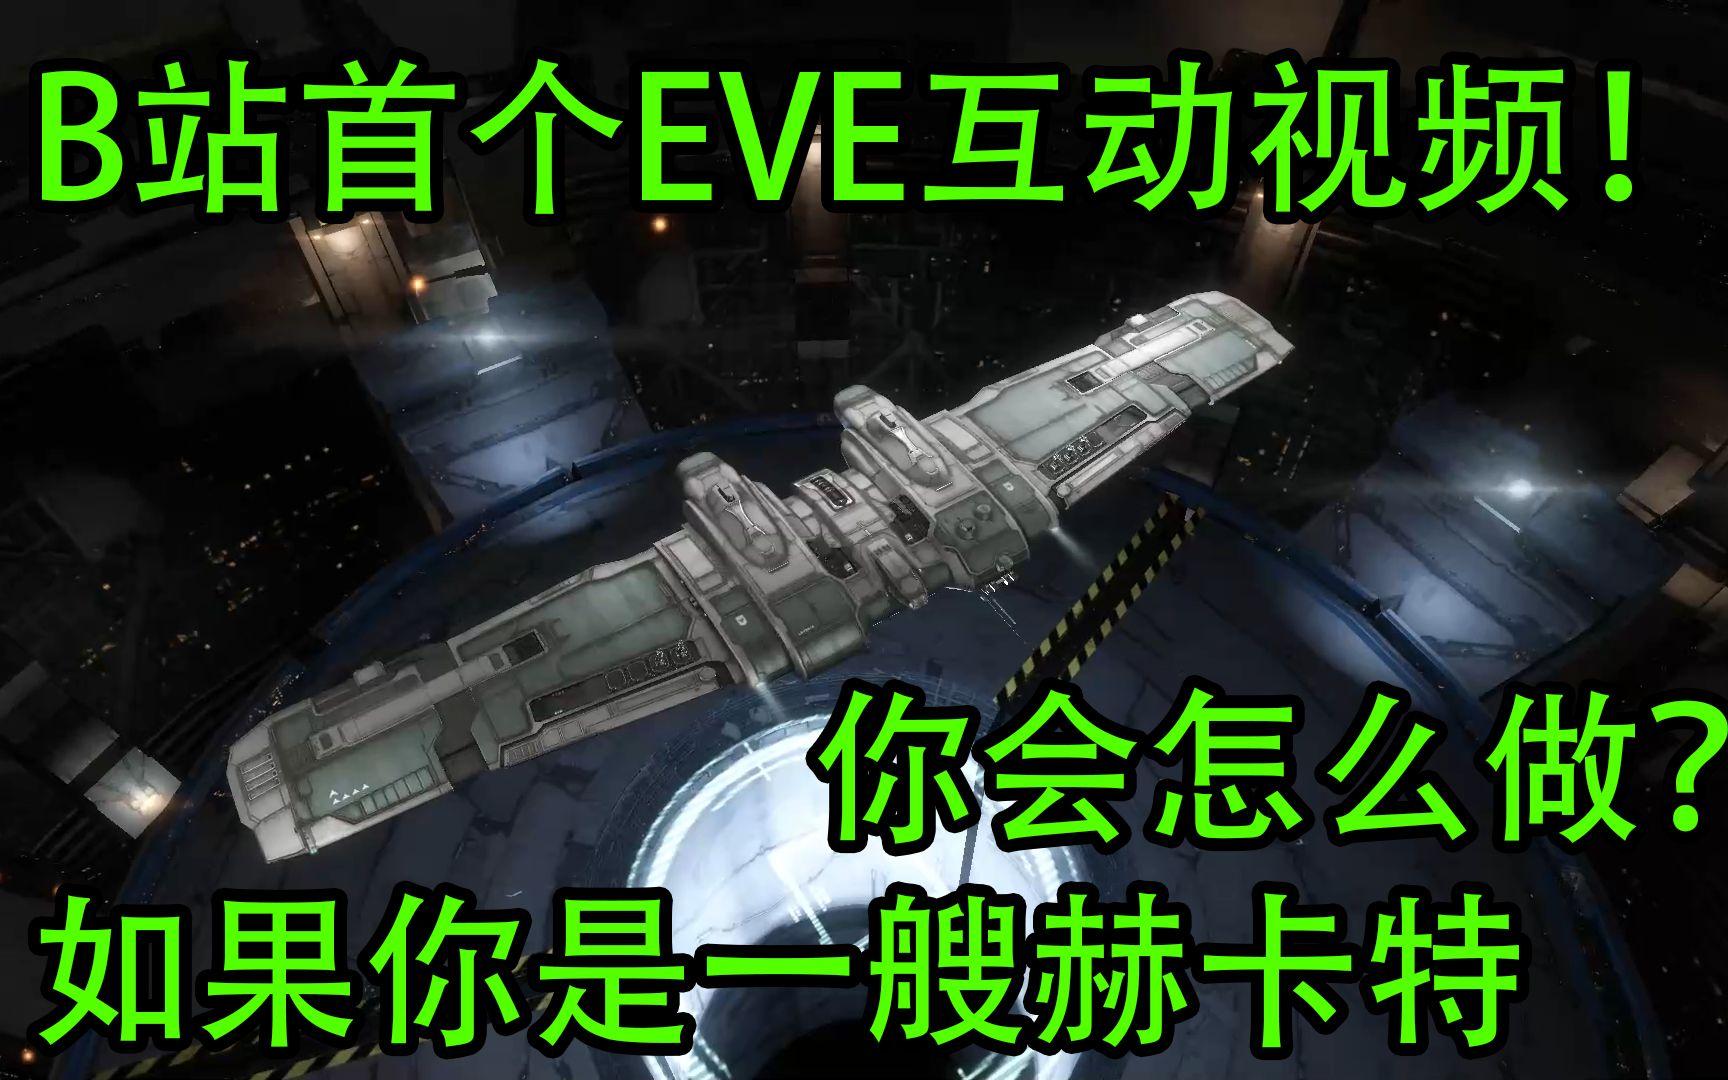 B站首個EVE互動視頻!如果你是一艘赫卡特,你會怎么做?_嗶哩嗶哩 (゜-゜)つロ 干杯~-bilibili